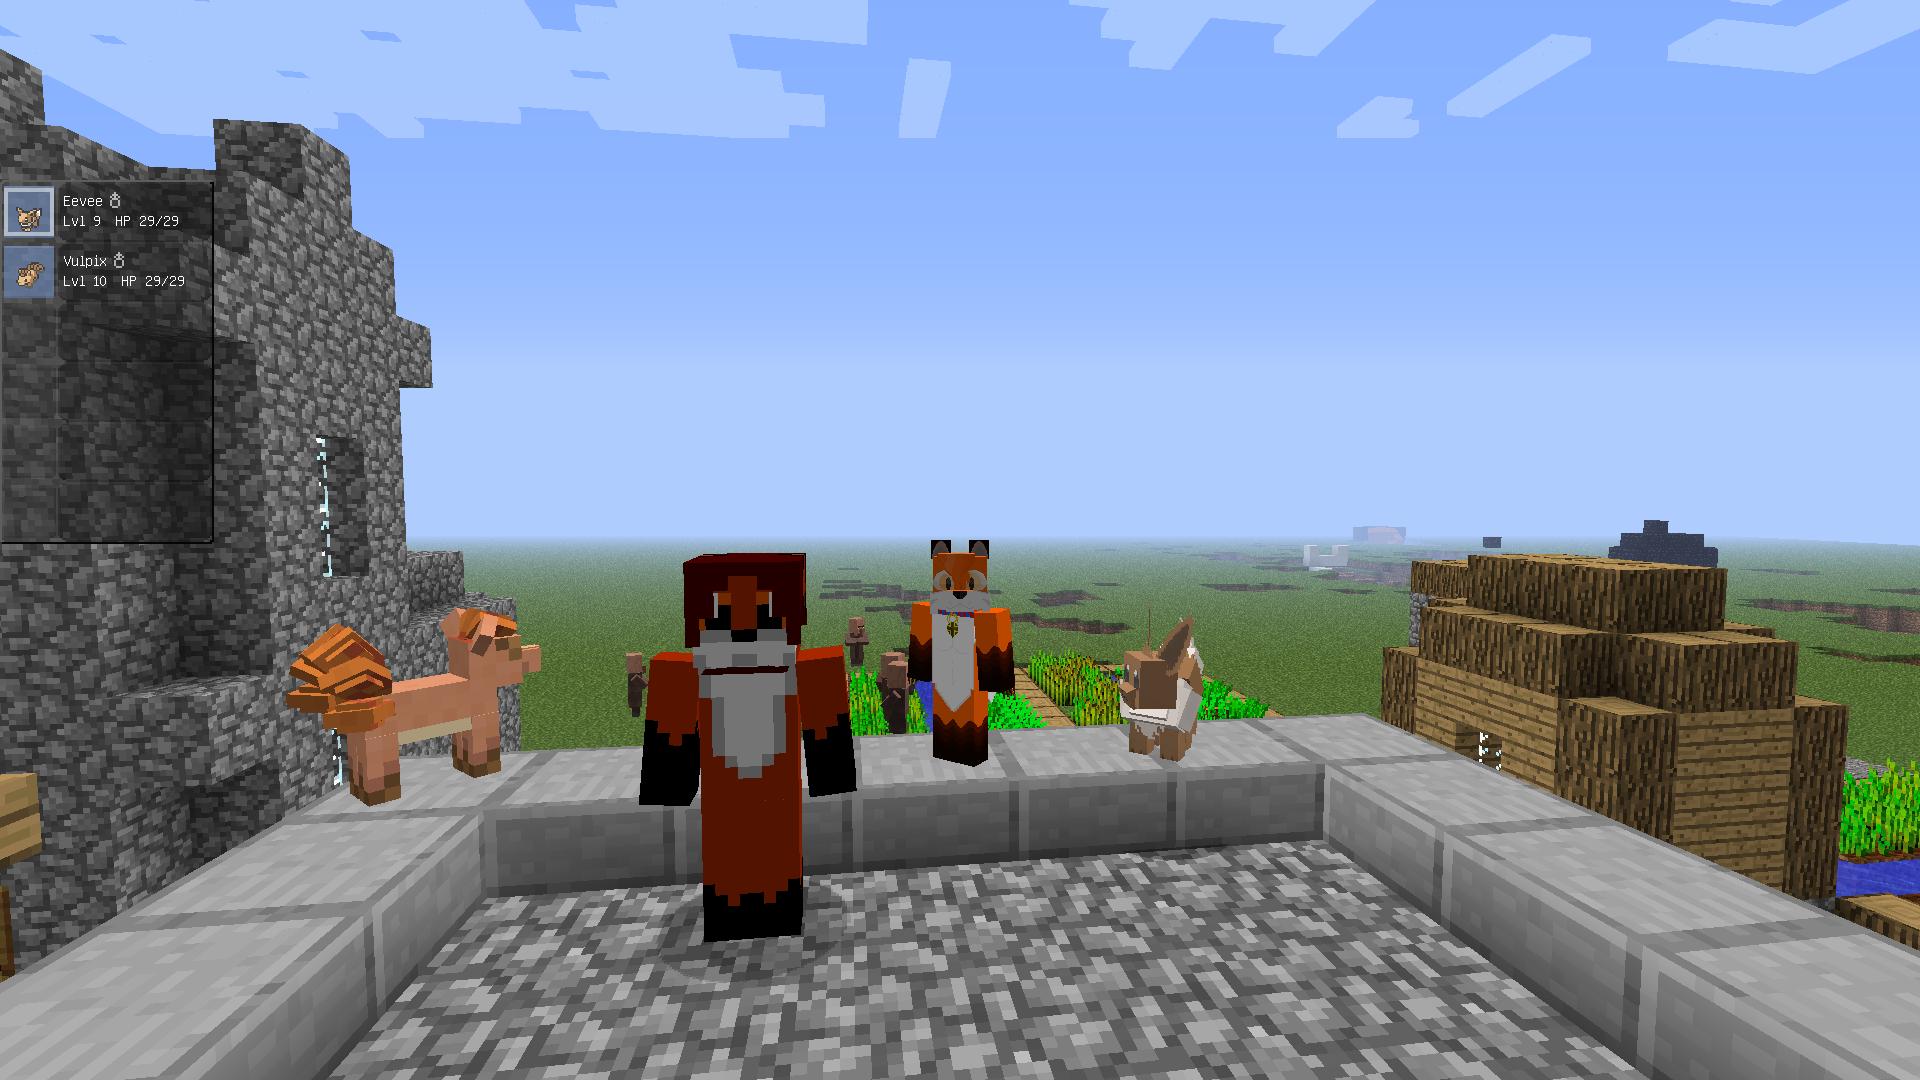 Change Foxy Change By Shinxgod On DeviantArt - Foxy skins fur minecraft